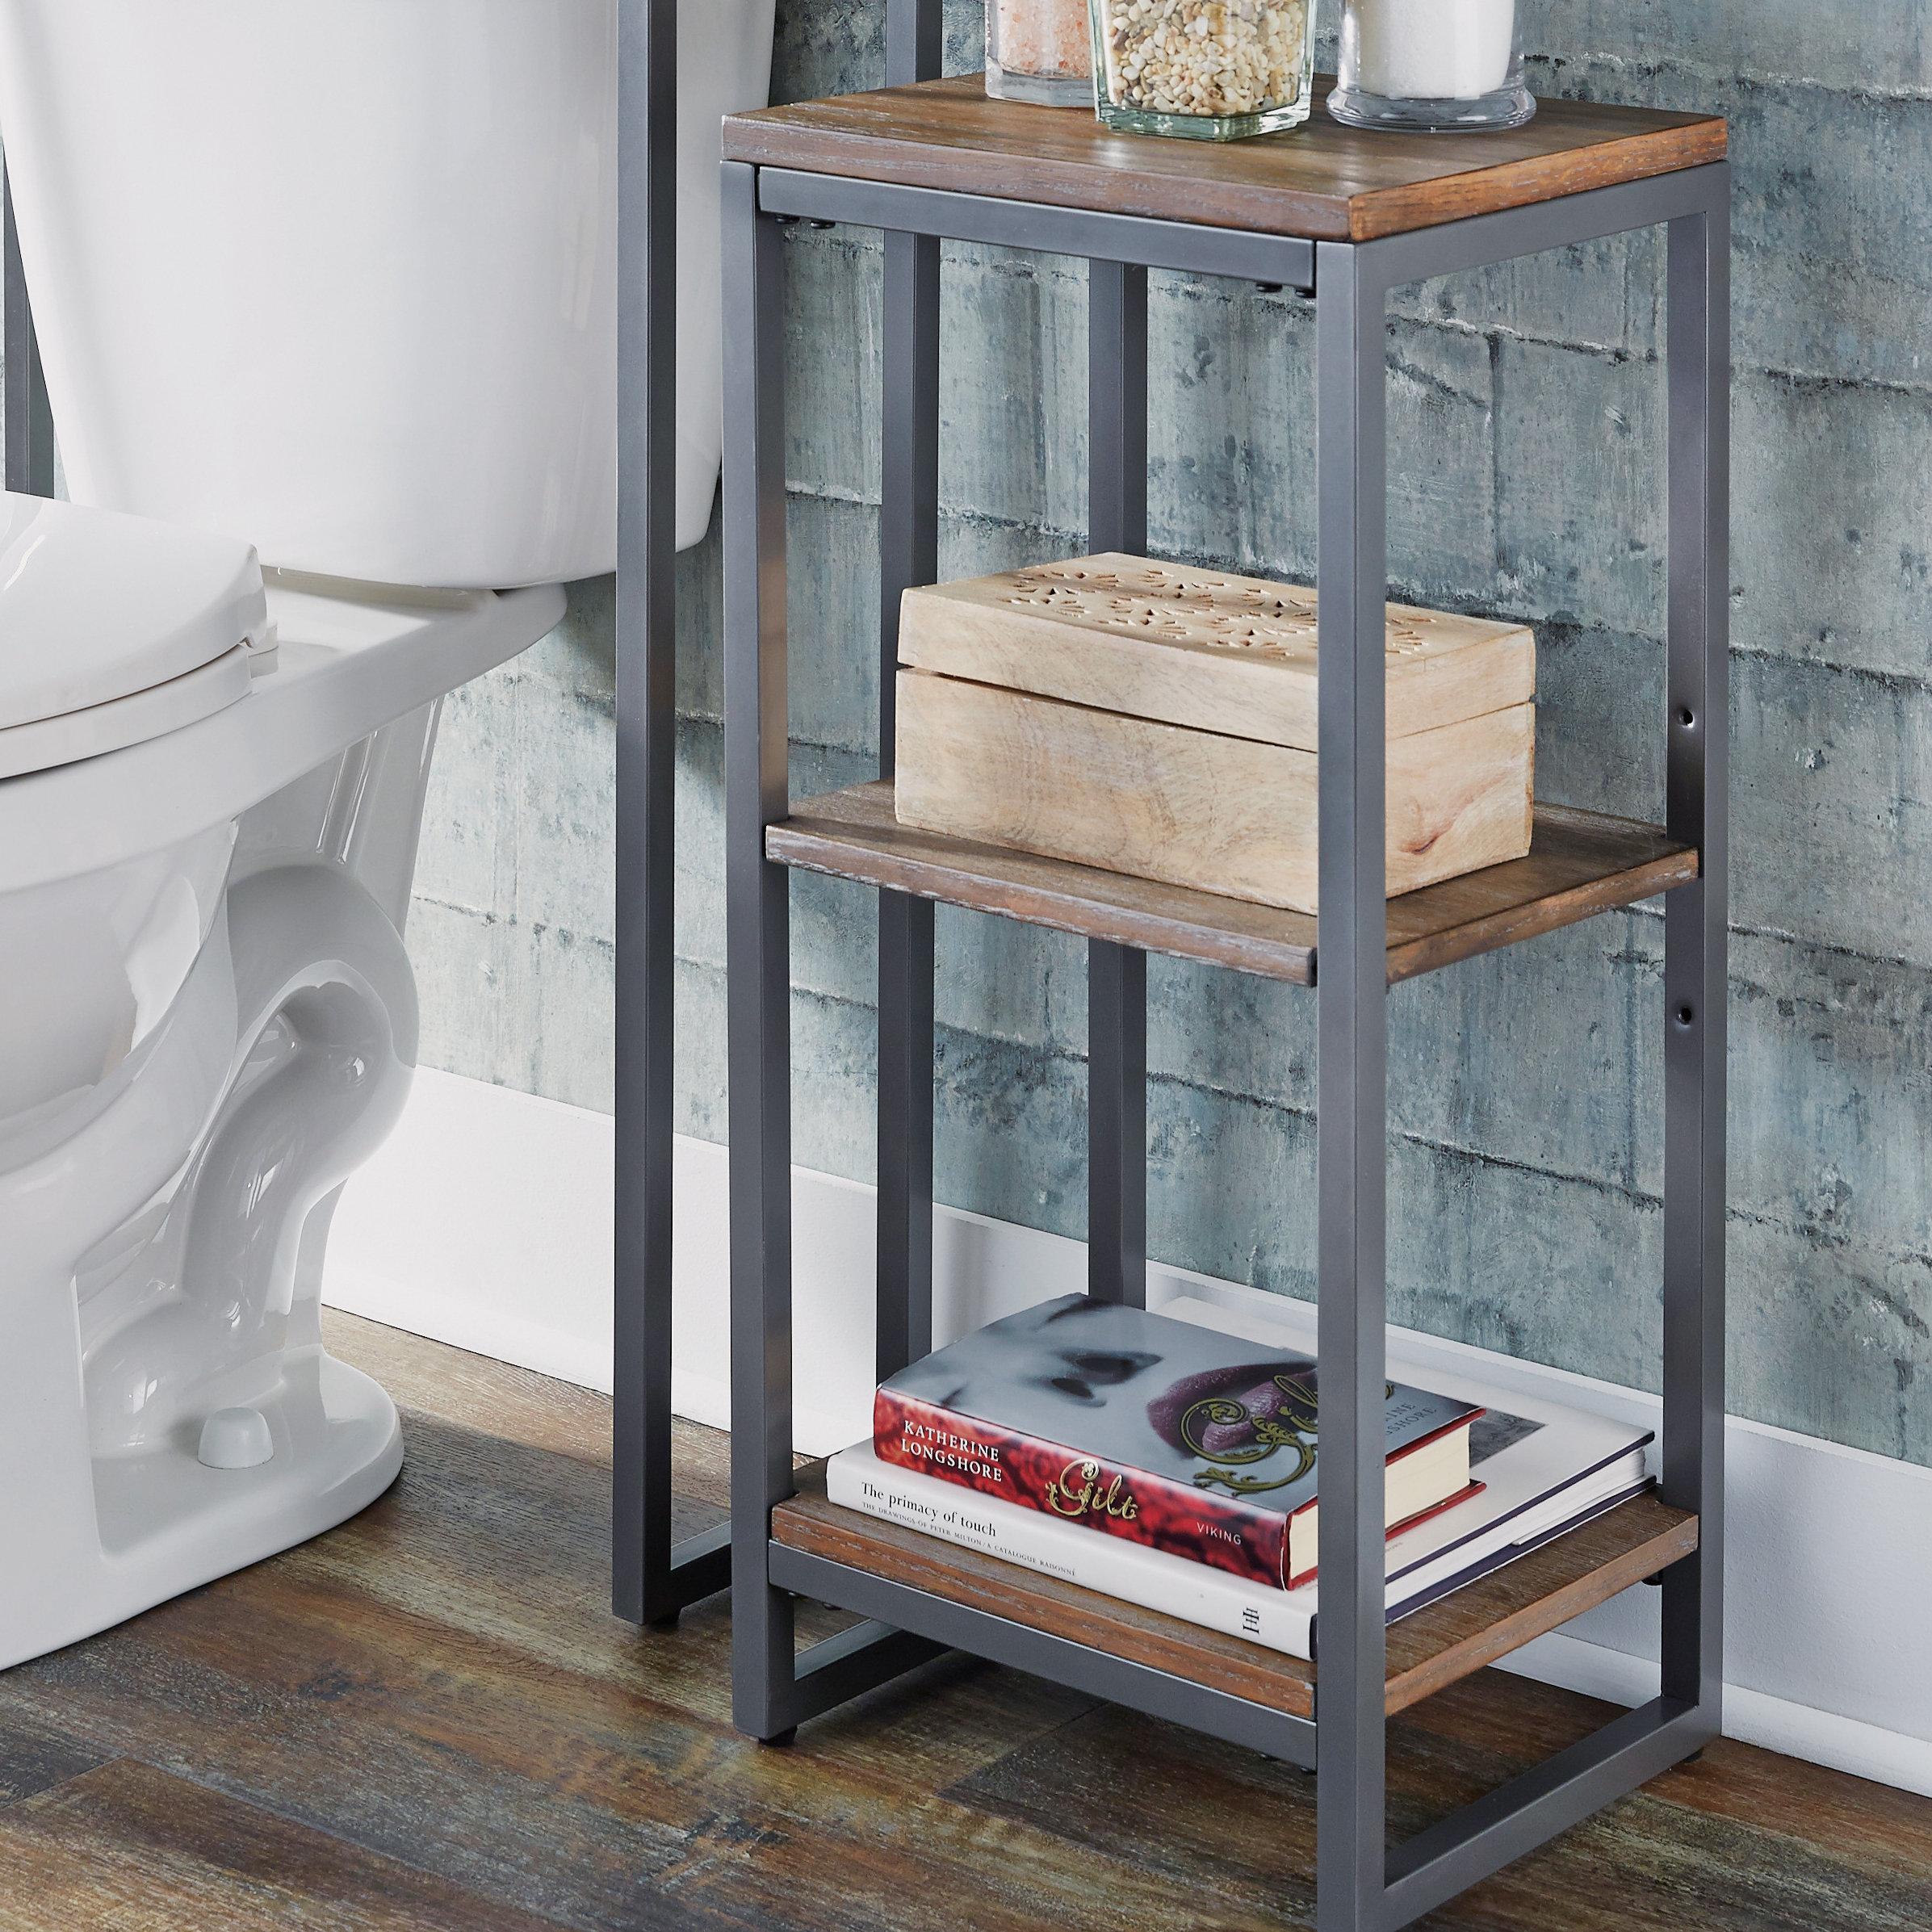 ideas bathroom shelf lane rustic interesting diy throughout smart images shelves lavendar and seeking